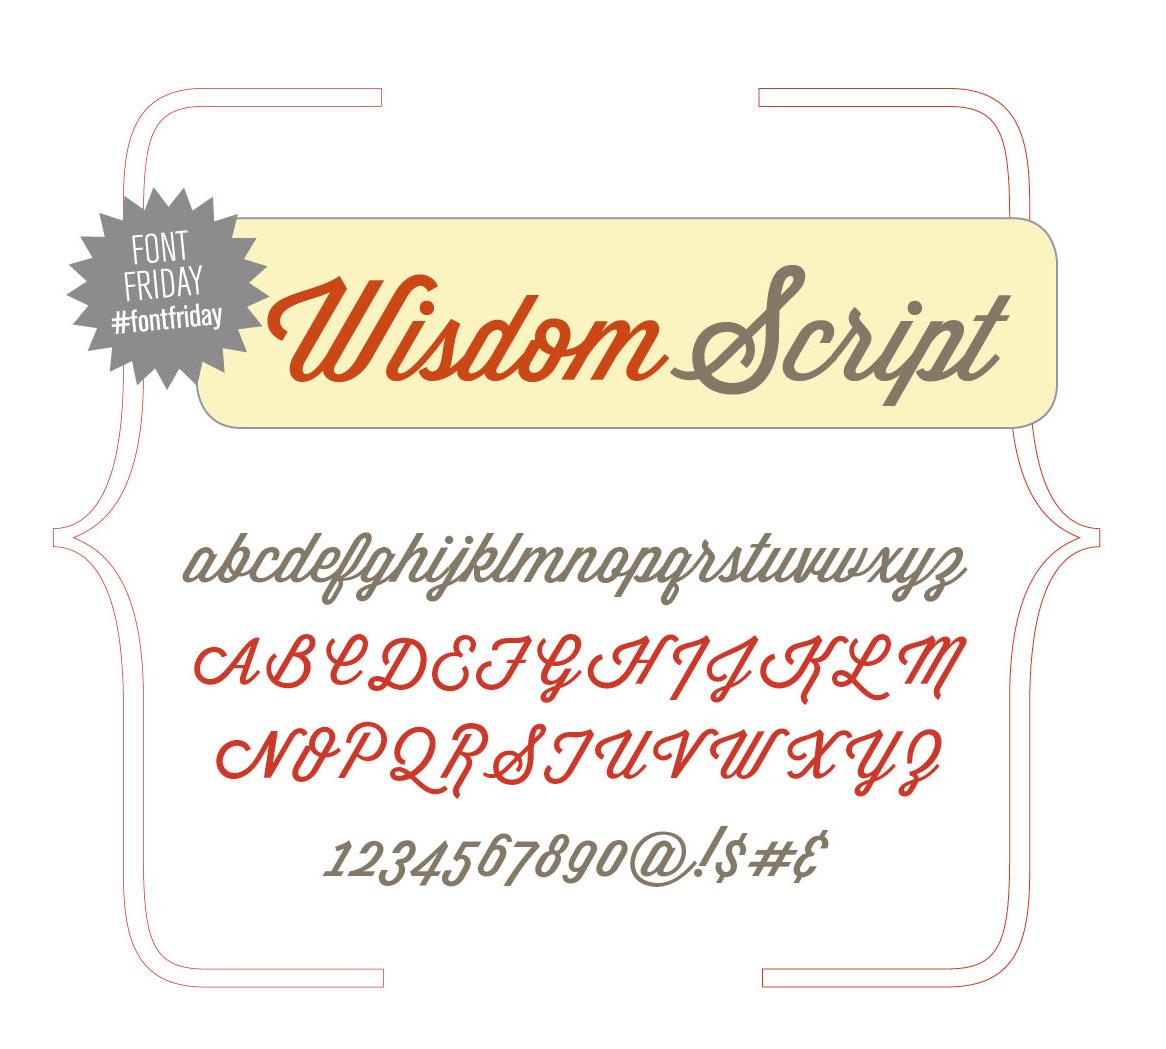 Download Kumpulan 30 Font Script Desainer grafis - Wisdom Script Font